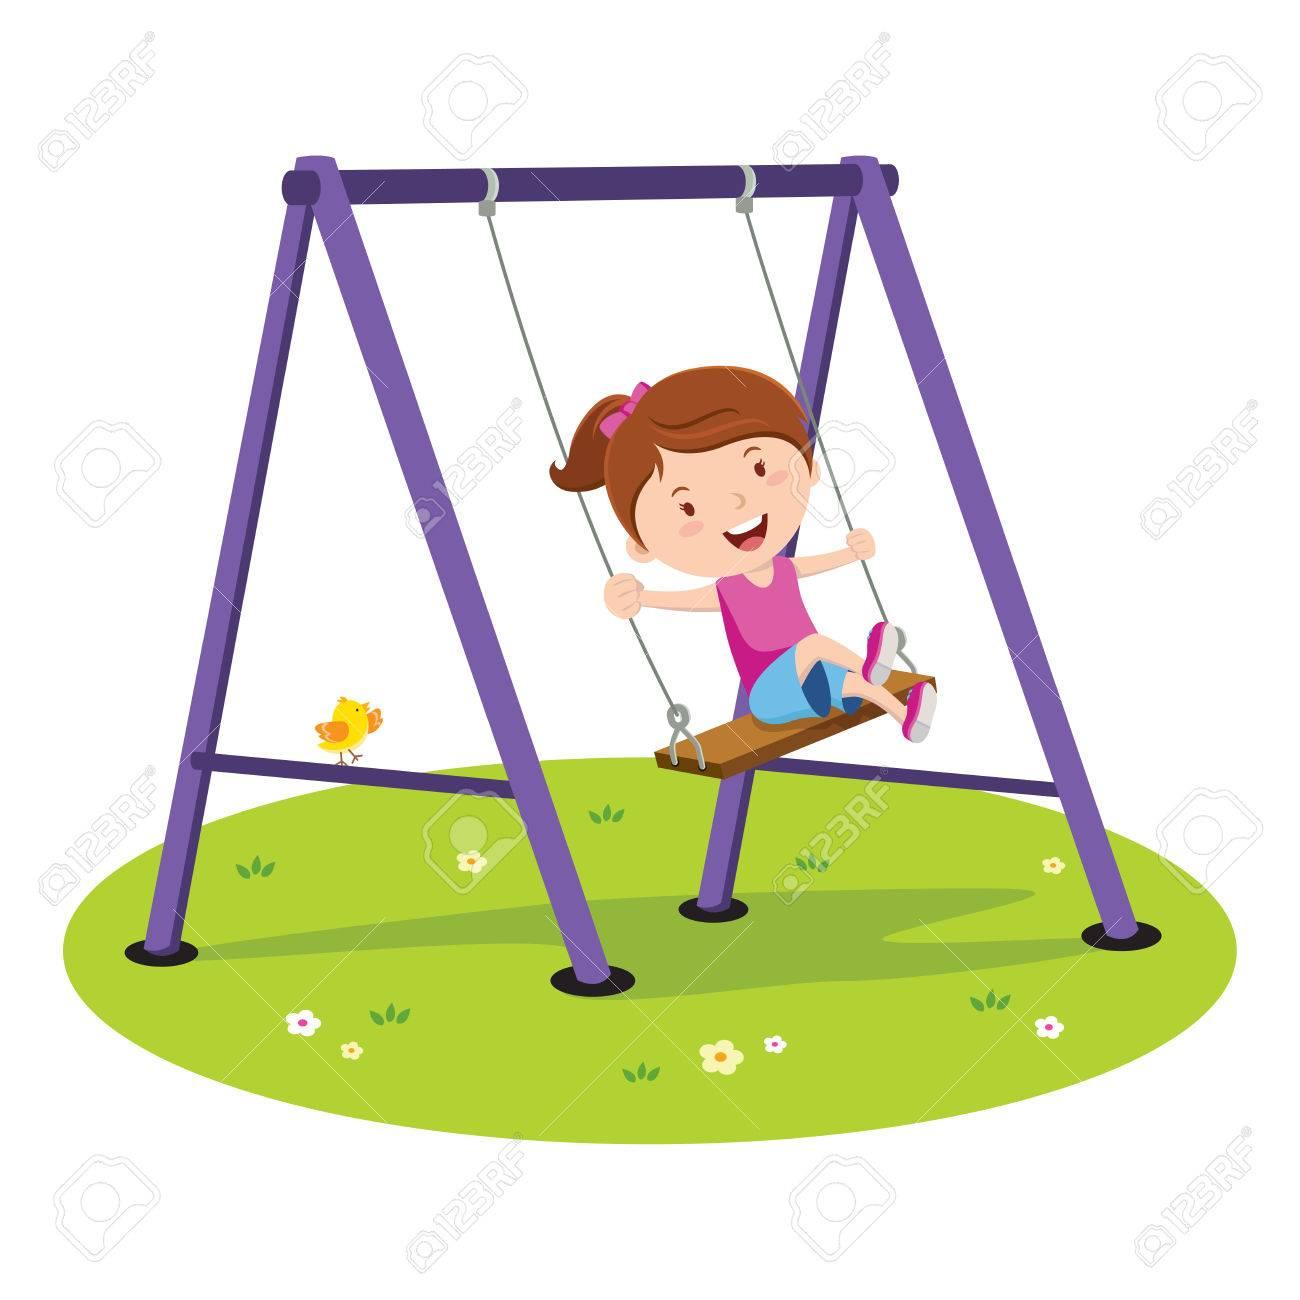 Swind clipart svg transparent stock Girl on swing clipart 4 » Clipart Station svg transparent stock